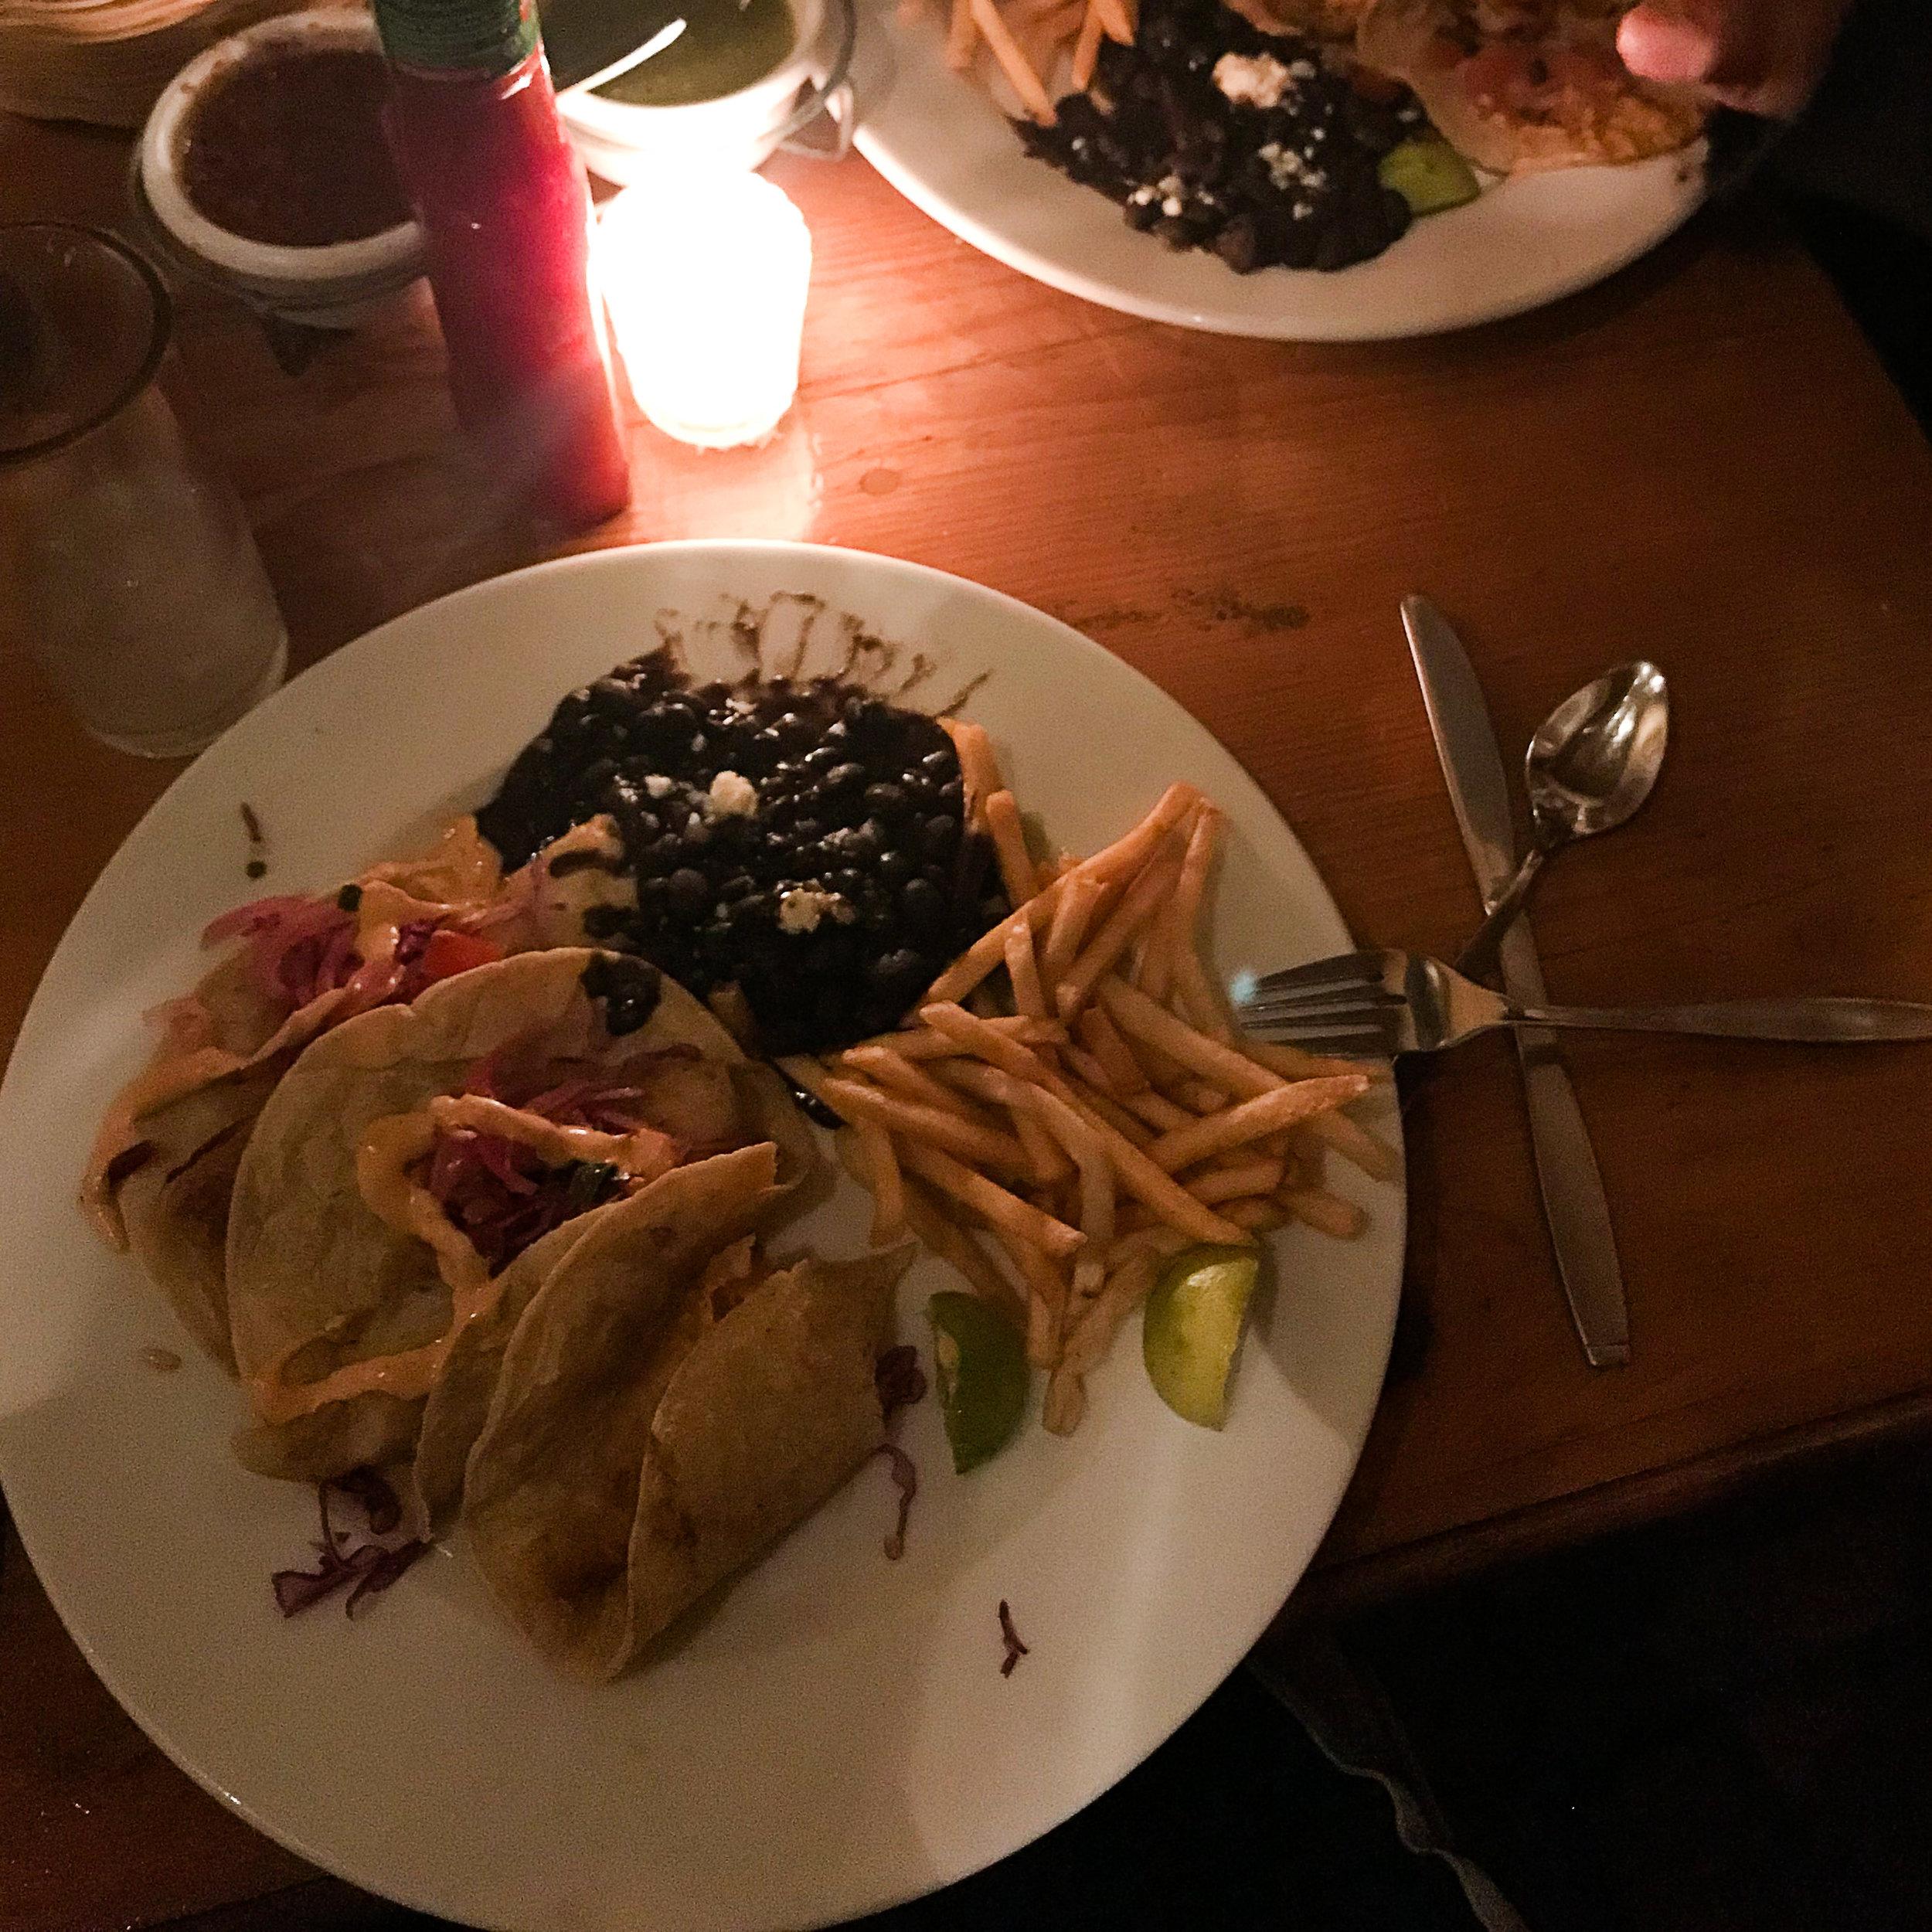 mexican-food-san-miguel-de-allende-restuarants-coffee-cafes-30.jpg